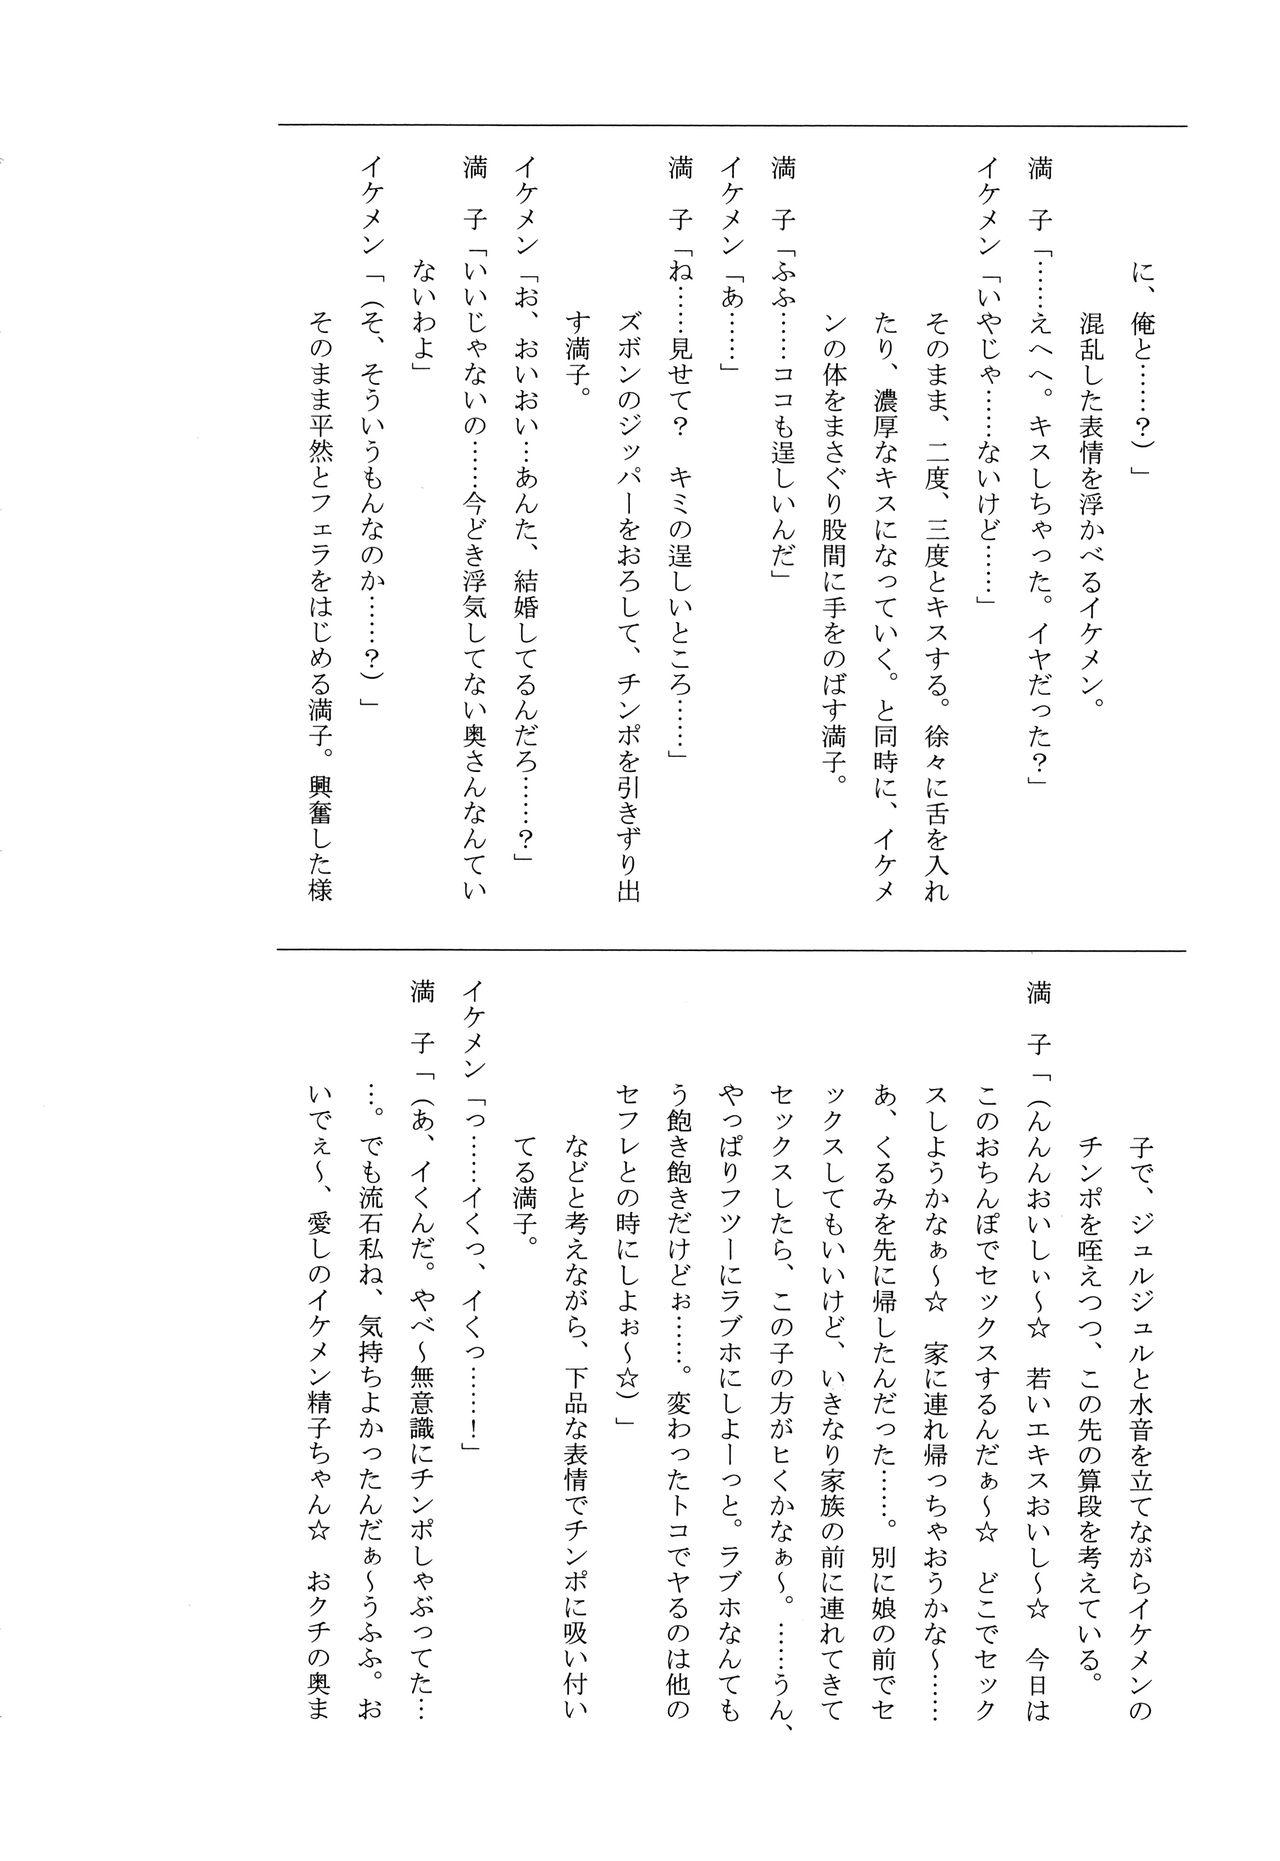 Teisou Kannen ZERO Shinsouban 1 187